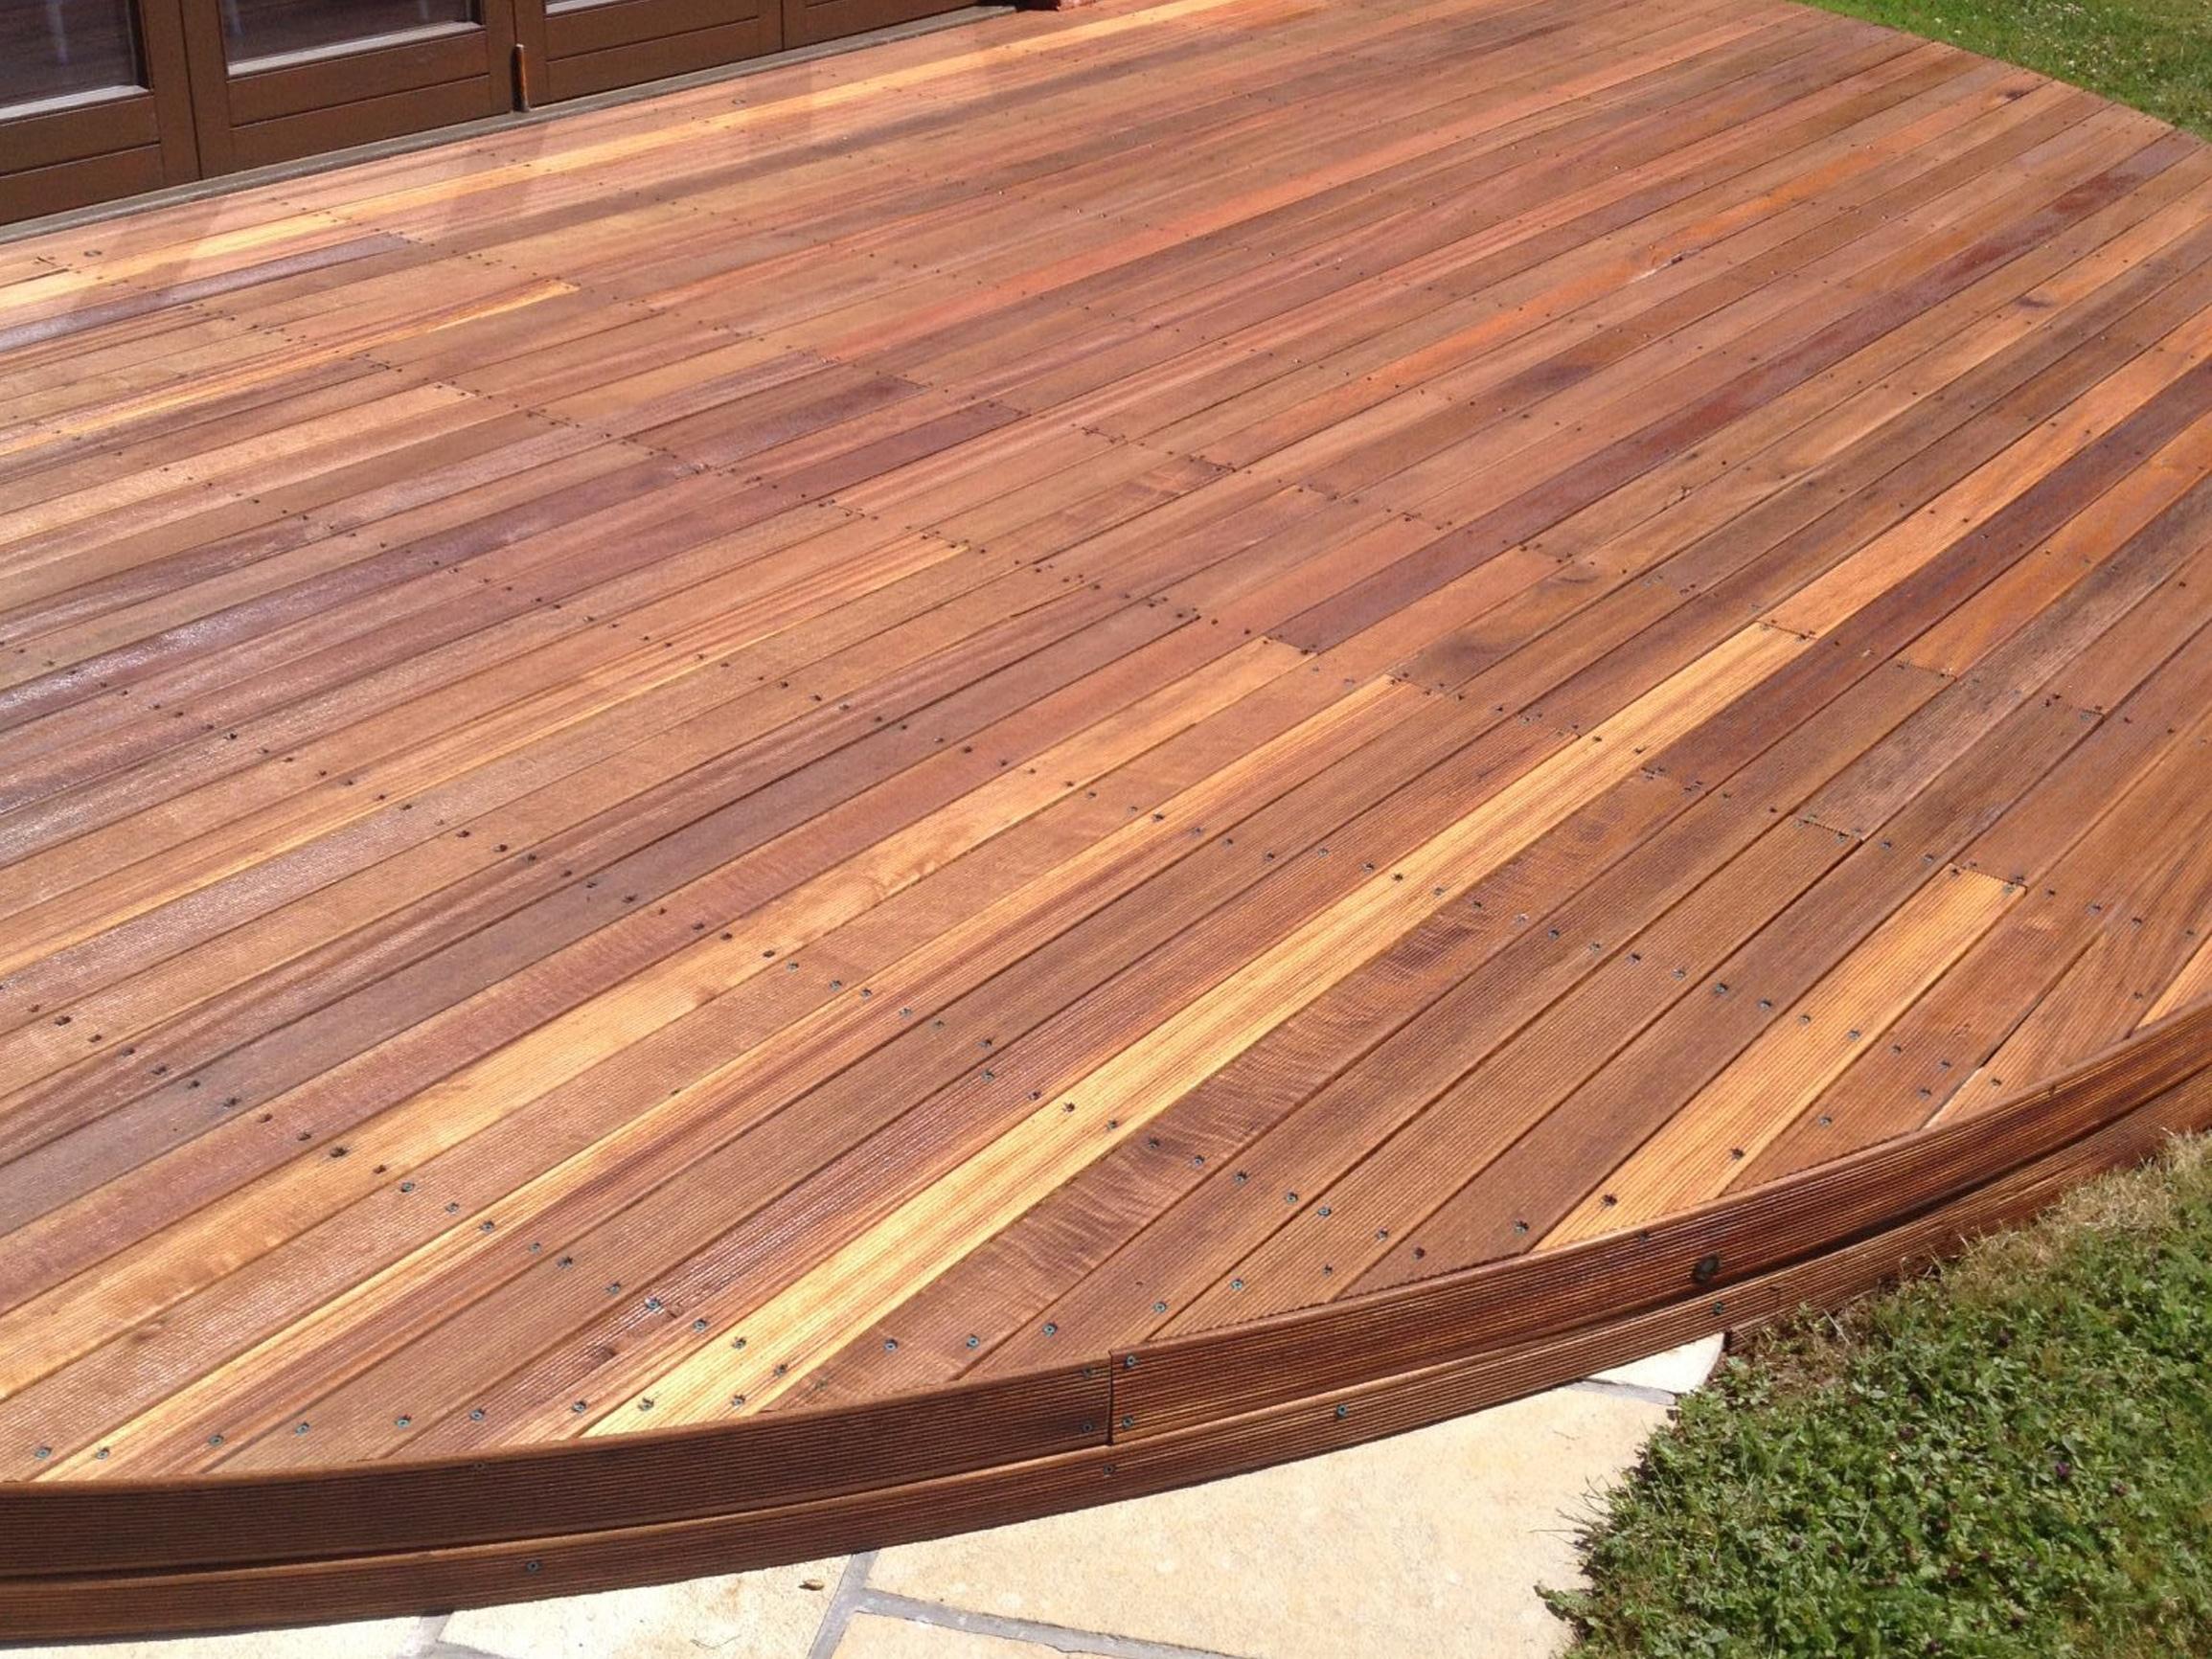 Textrol applied to garden deck by R&A Pressure Washing Services Ltd.